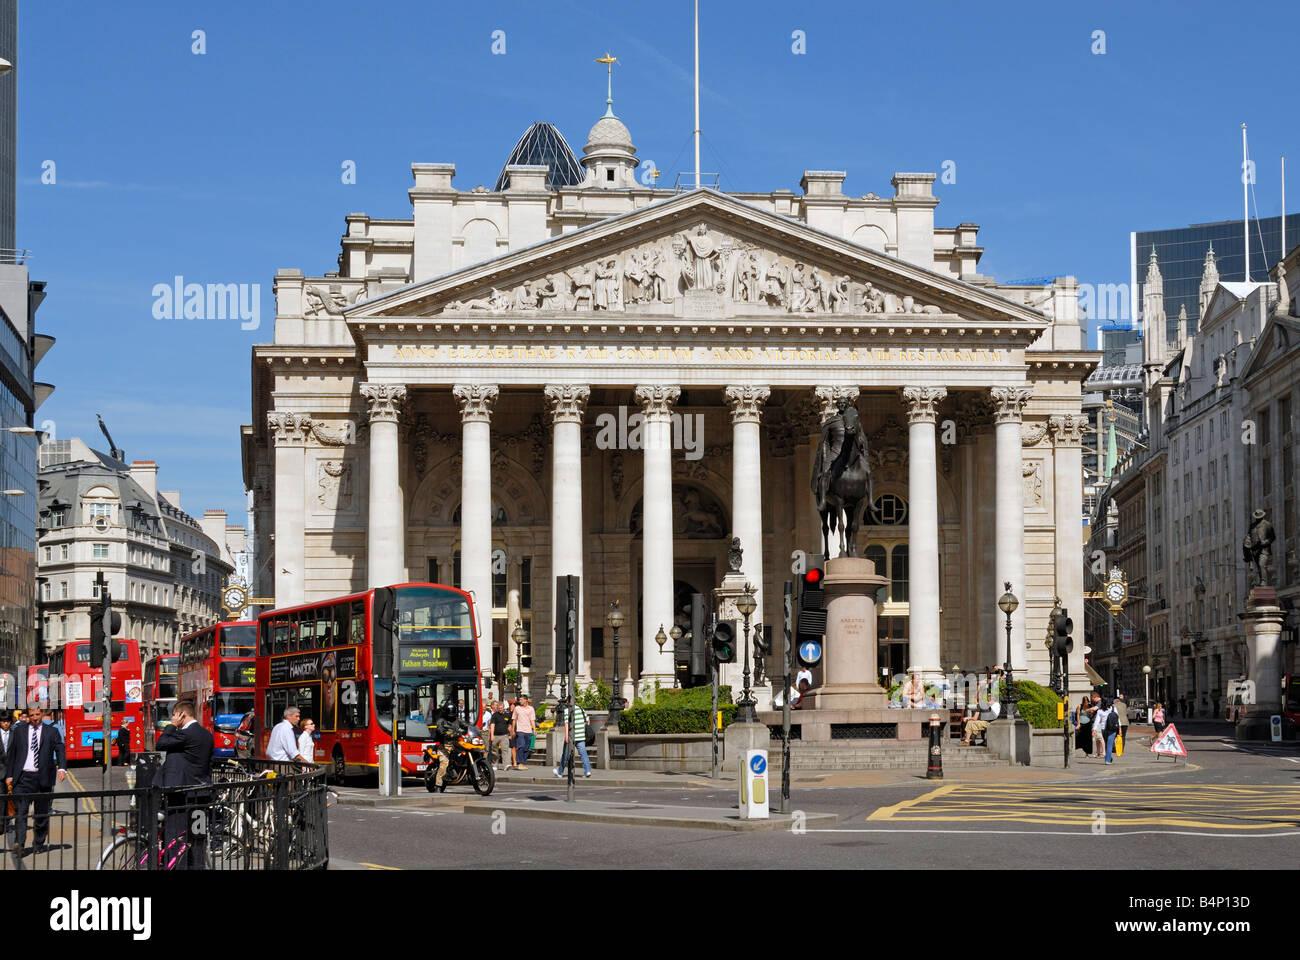 Royal Exchange London - Stock Image